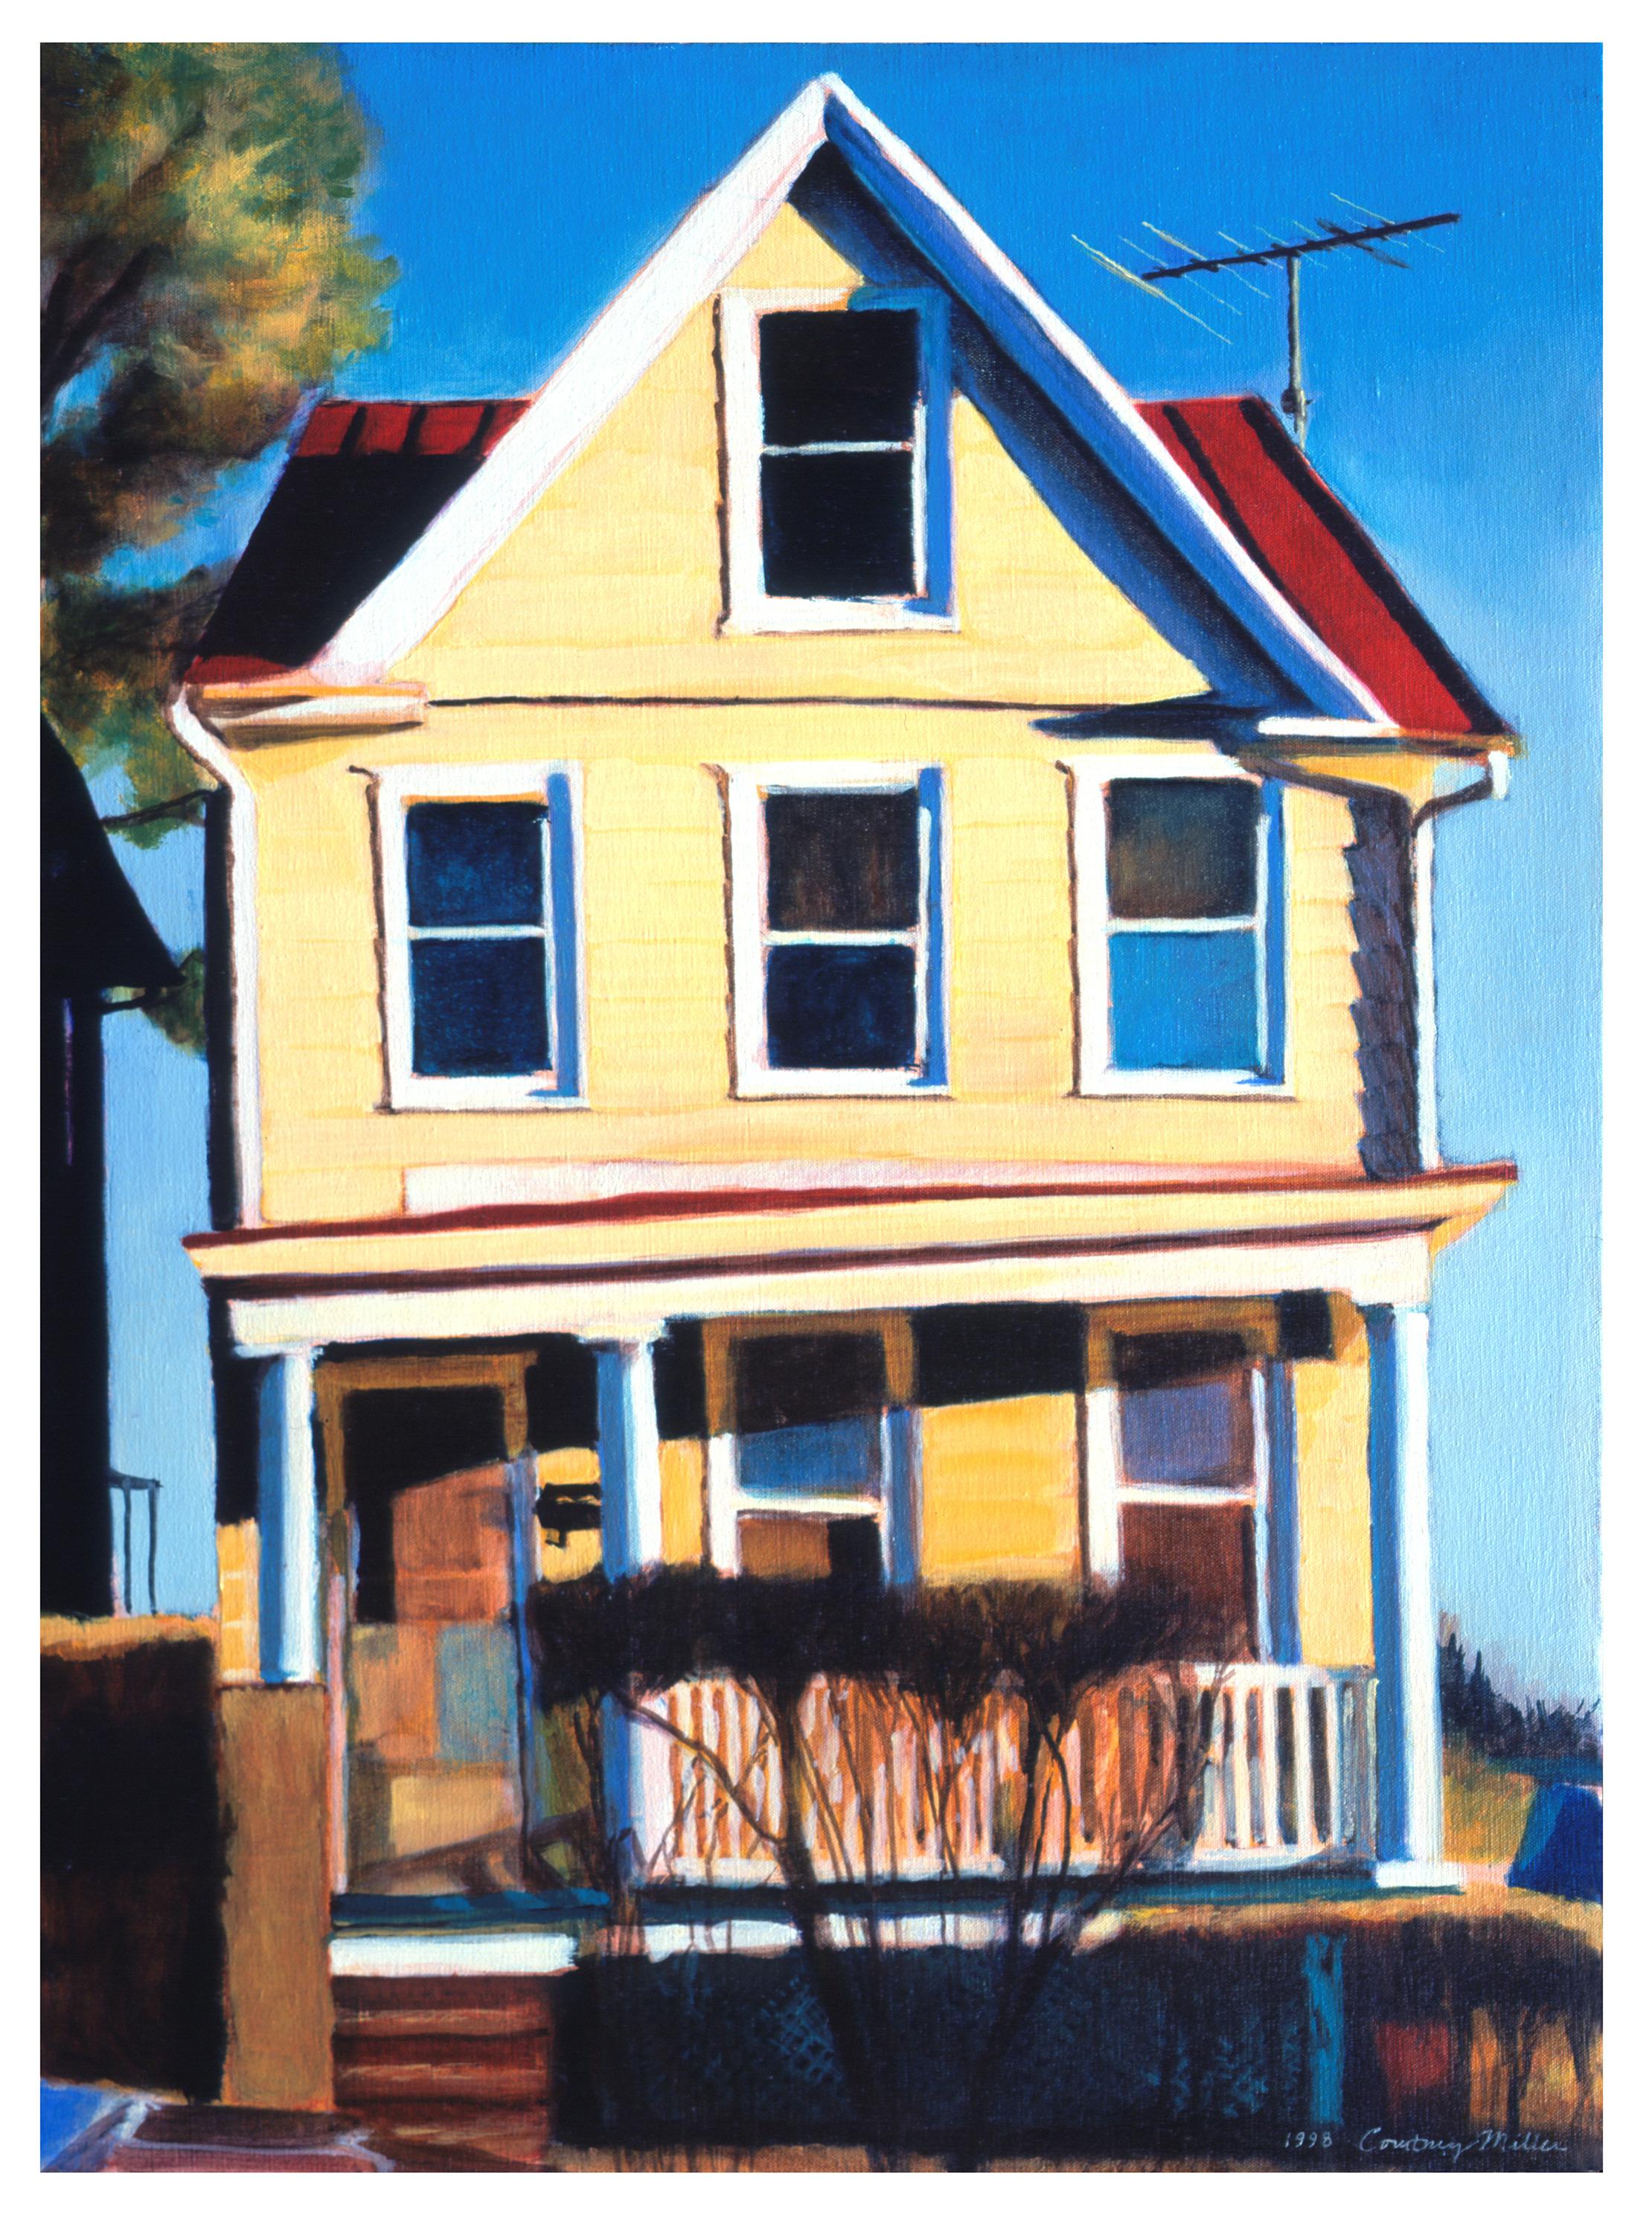 052 house bdbi35